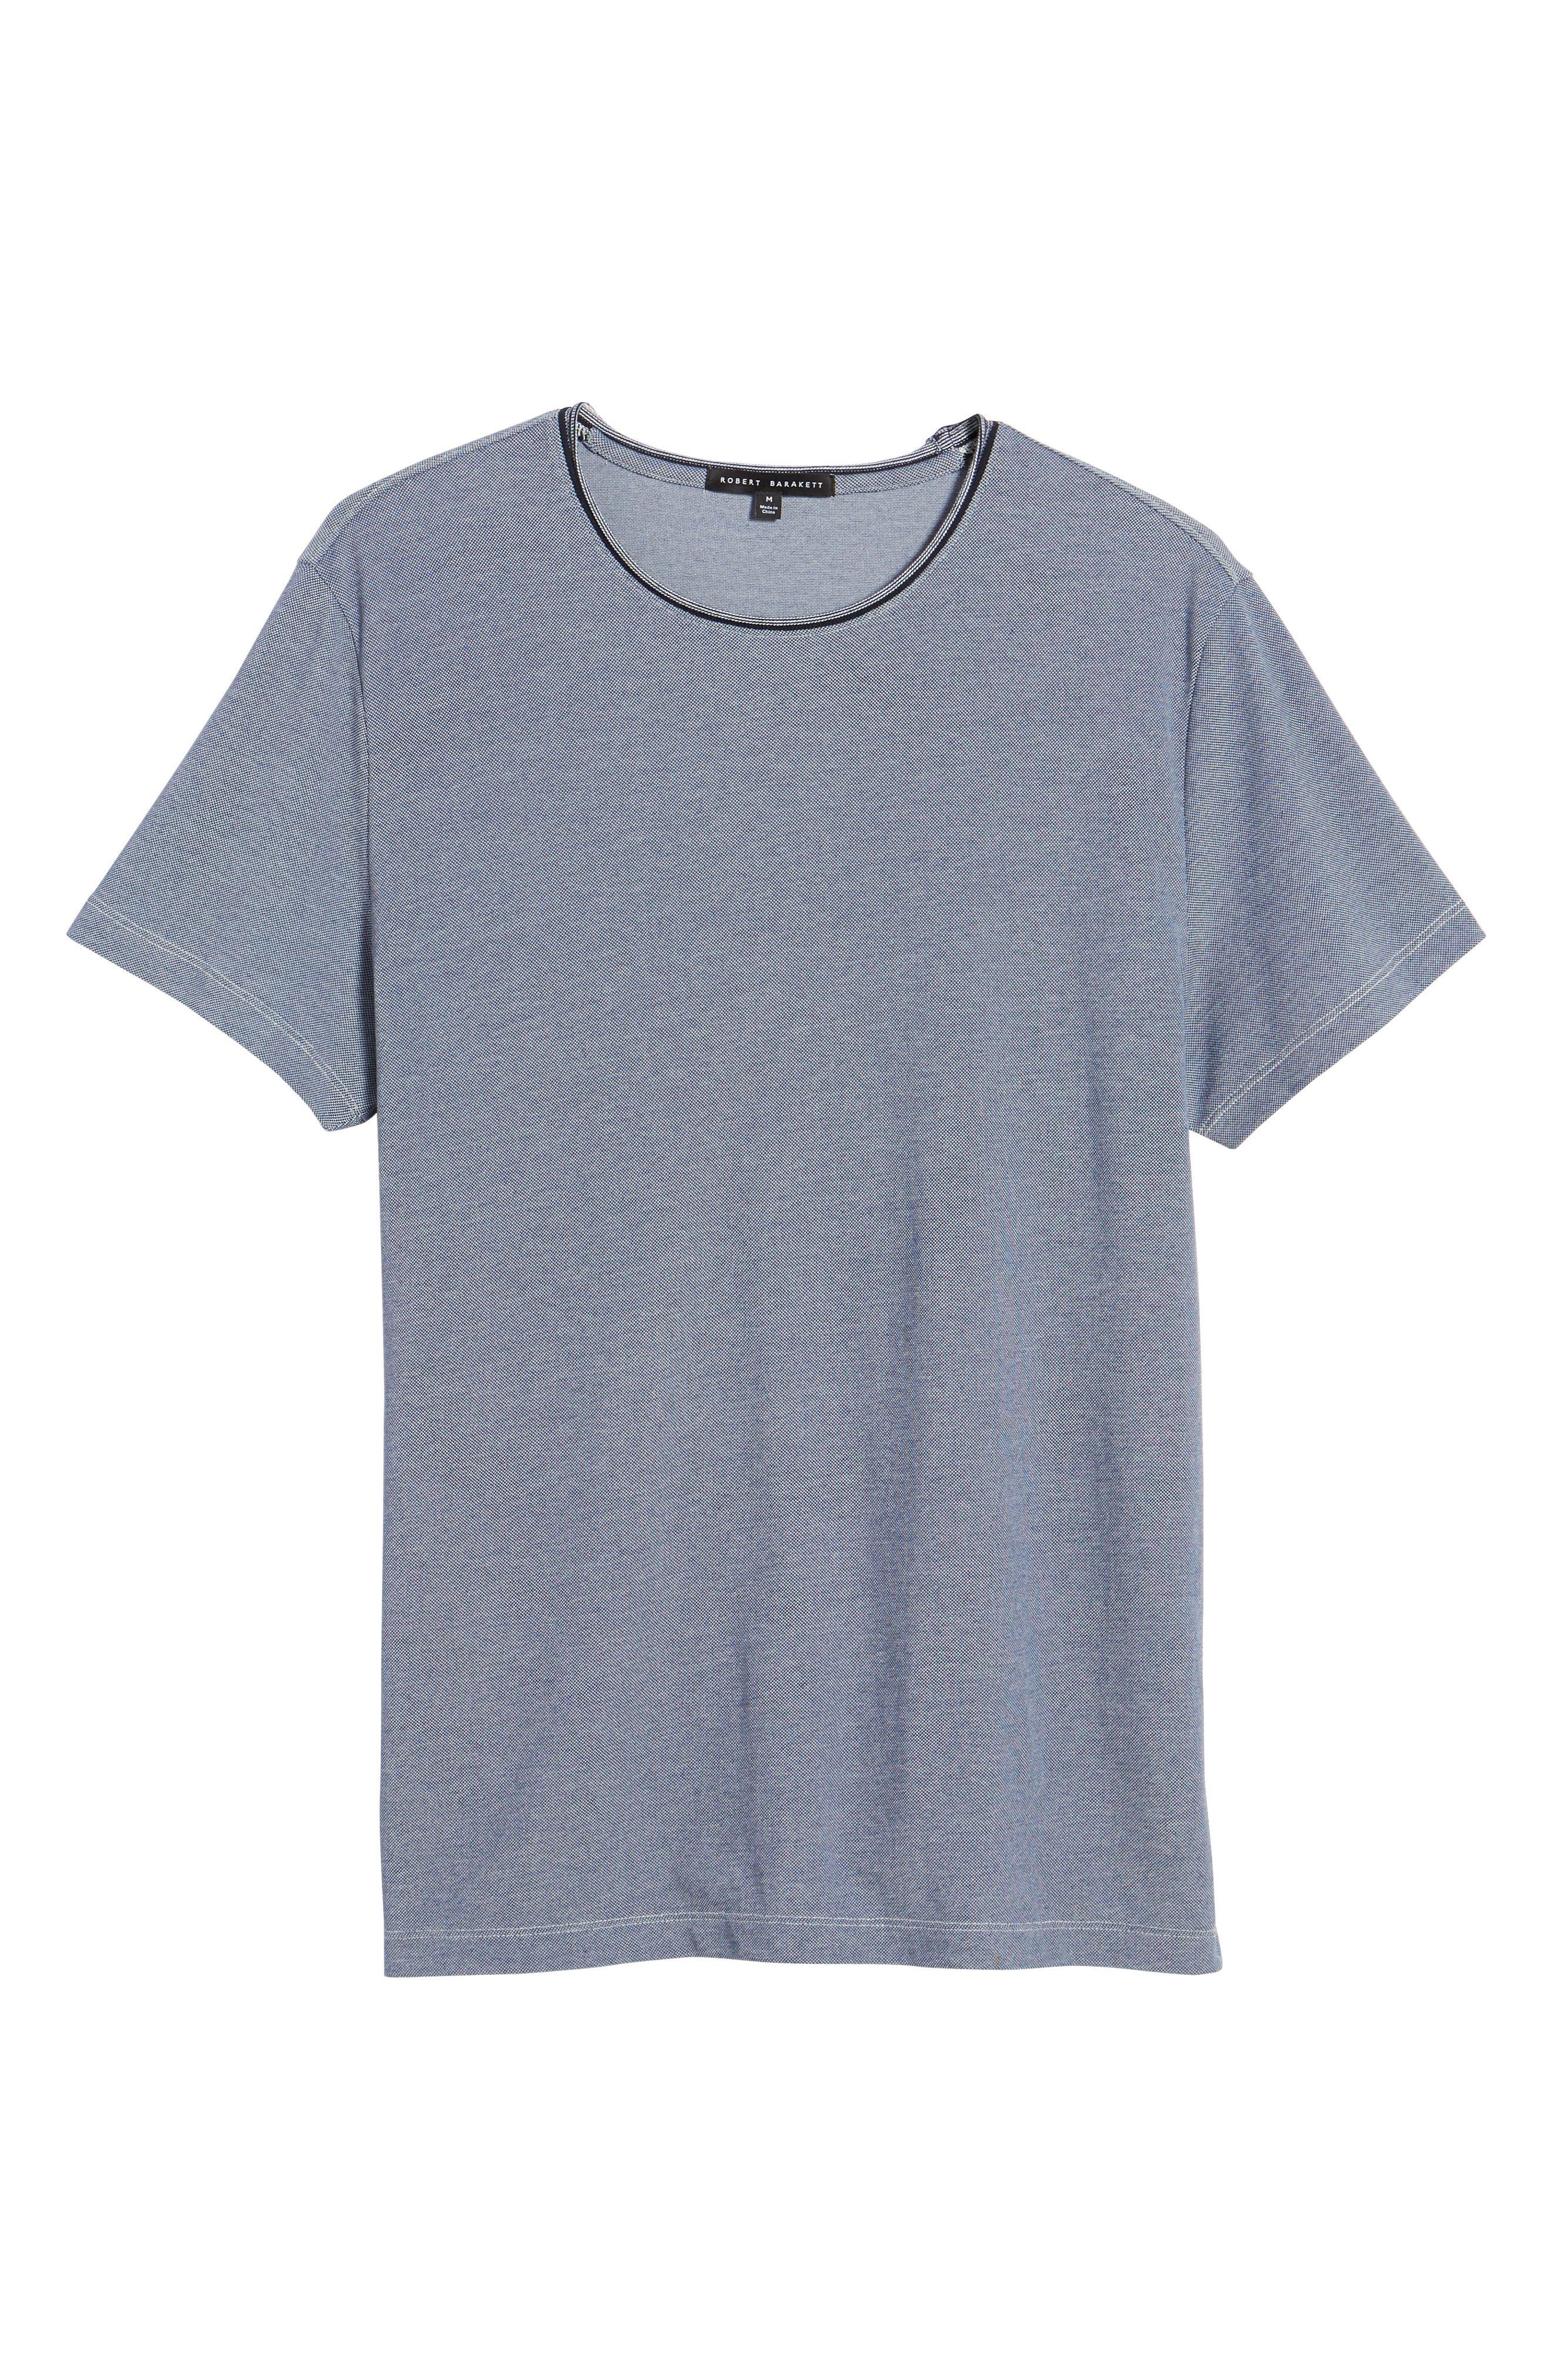 Grand Forks T-Shirt,                             Alternate thumbnail 6, color,                             410